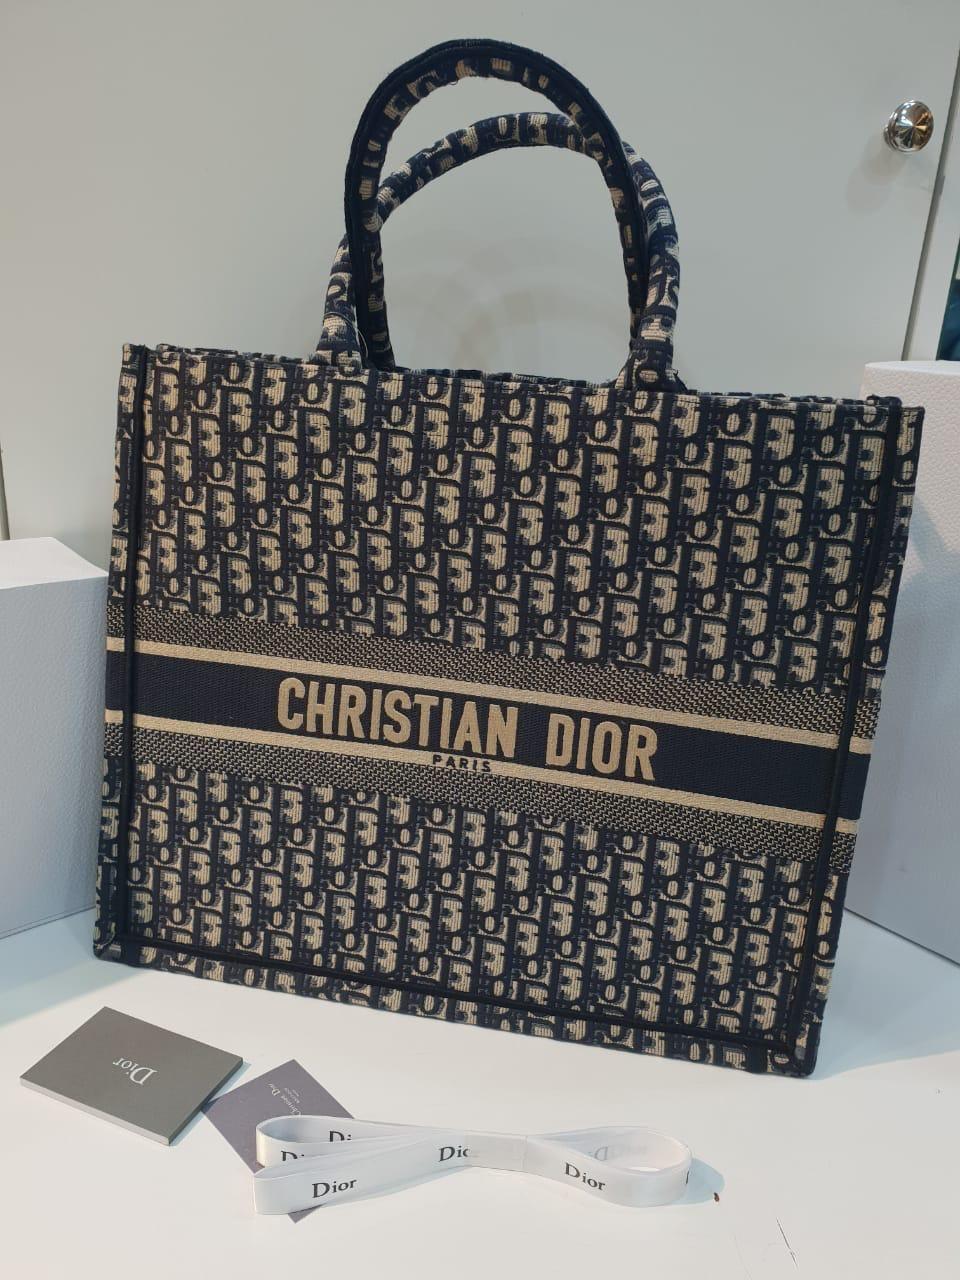 Dior Fake Bags Dior Dior Handbags Bags